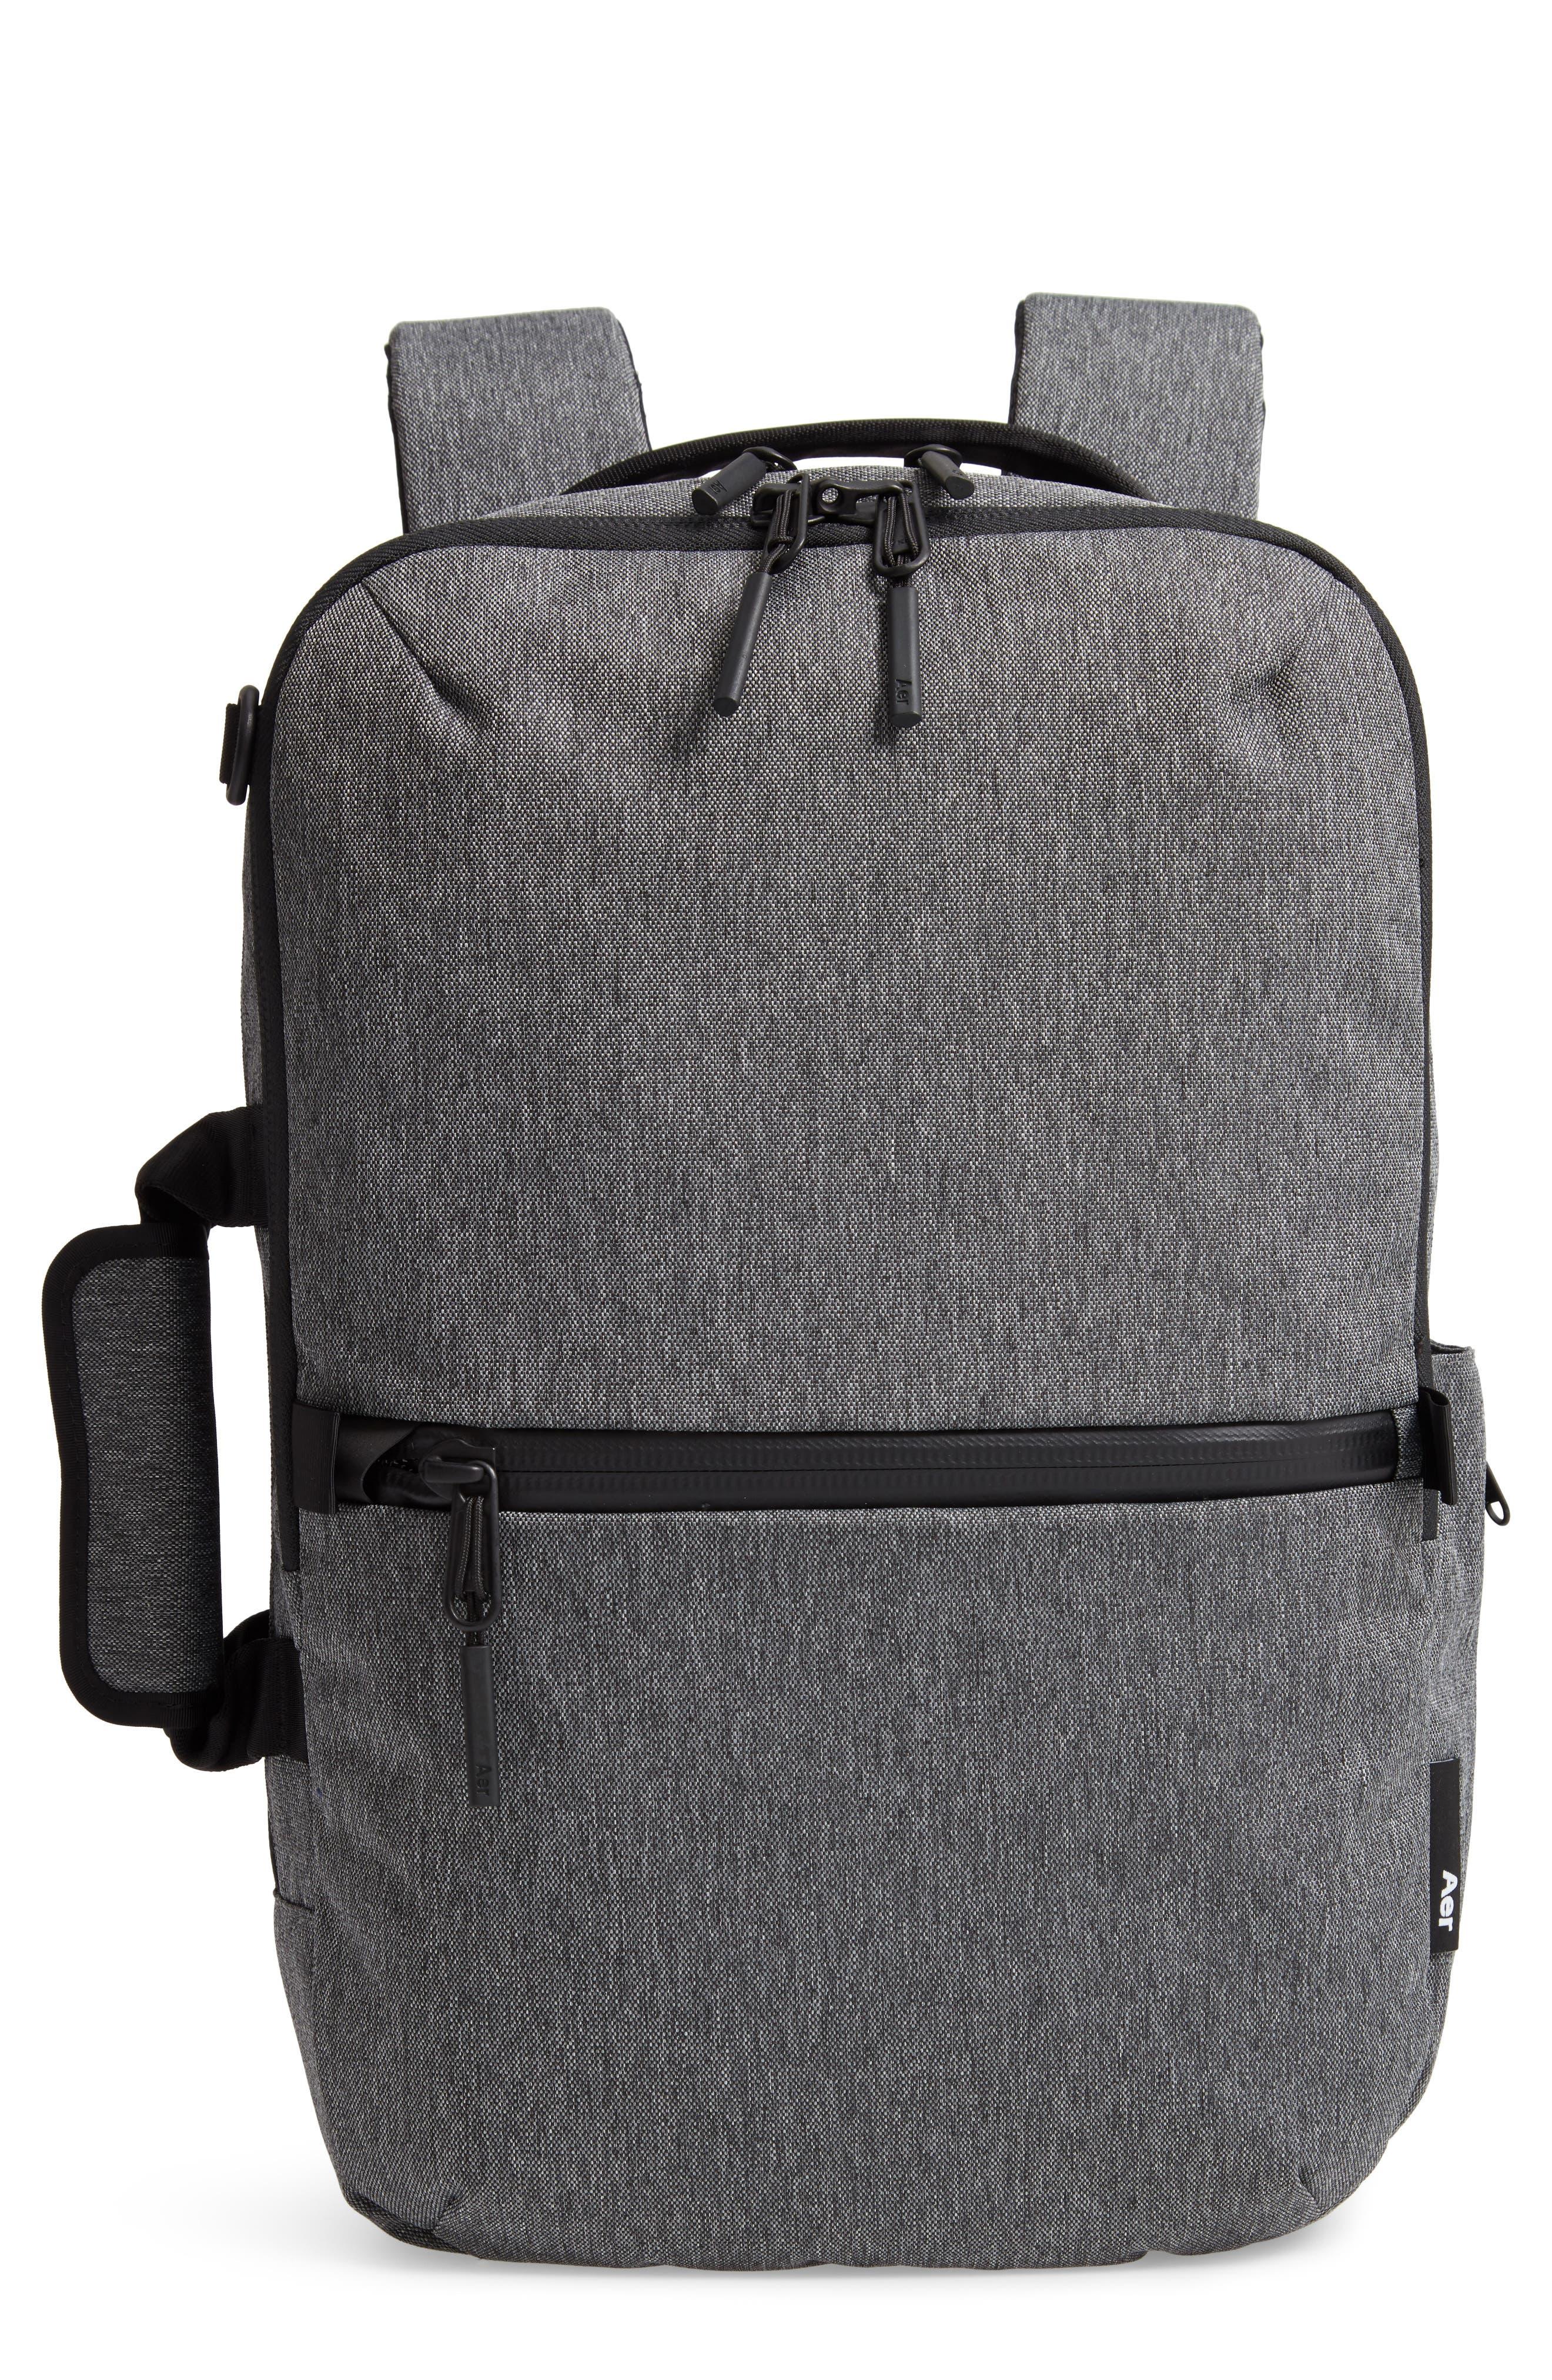 Flight Pack 2 Backpack,                         Main,                         color, 020